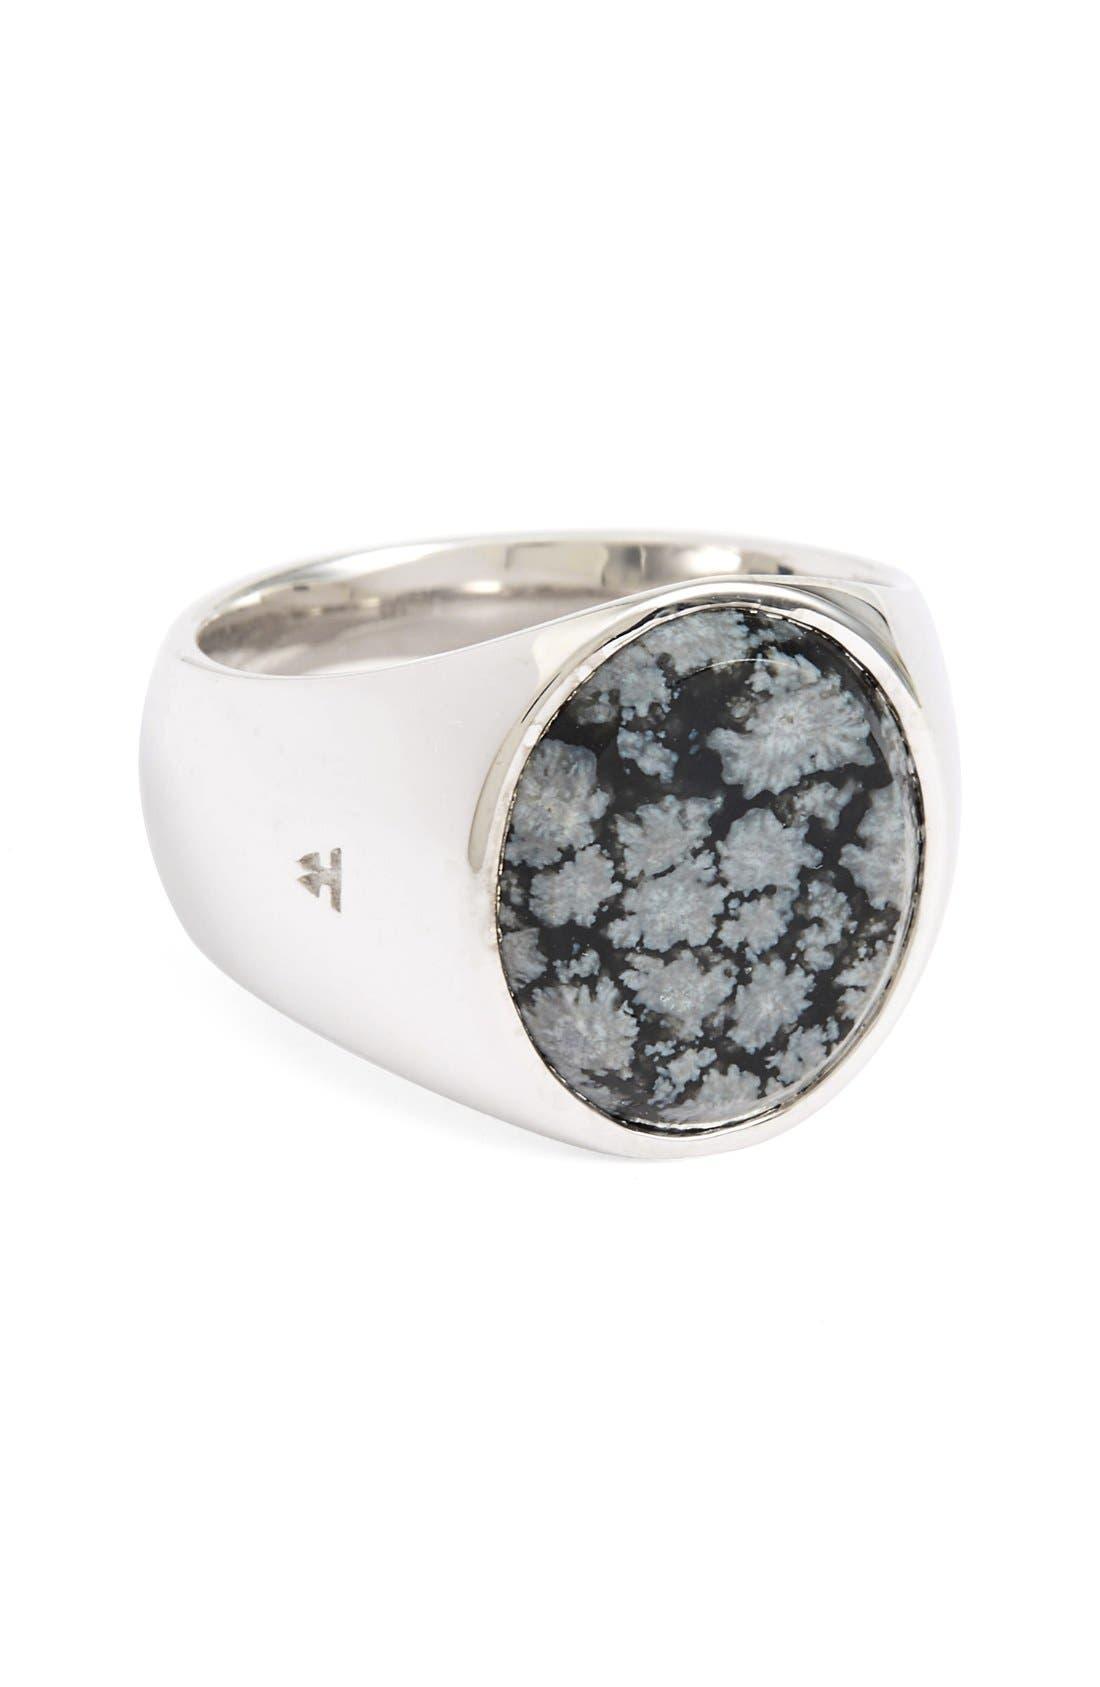 Alternate Image 1 Selected - Tom Wood Snowflake Obsidian Oval Signet Ring